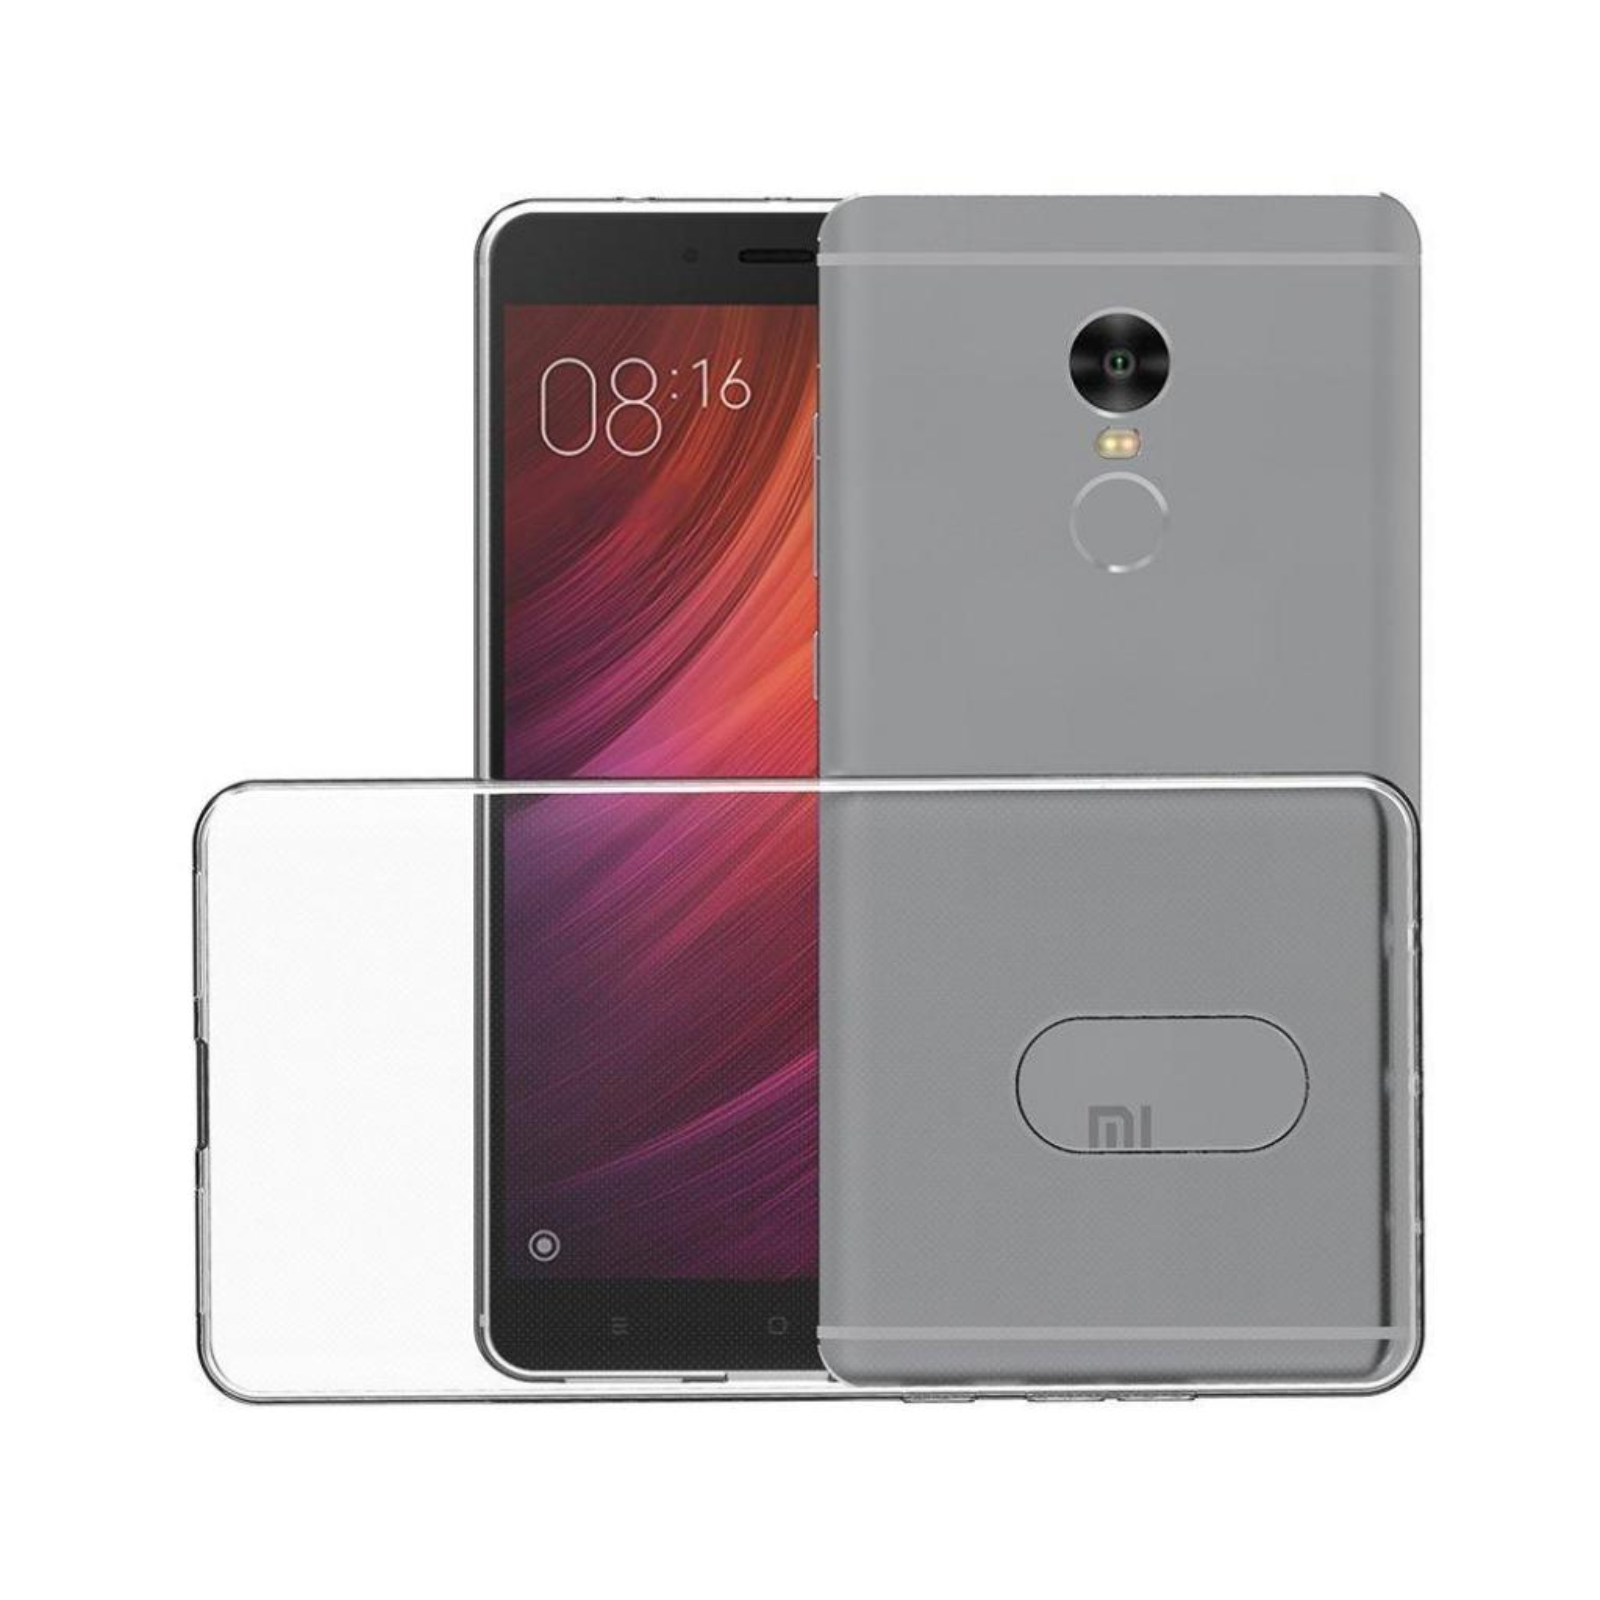 Чехол для моб. телефона SmartCase Xiaomi Redmi Note 4 TPU Clear (SC-RMIN4) изображение 4